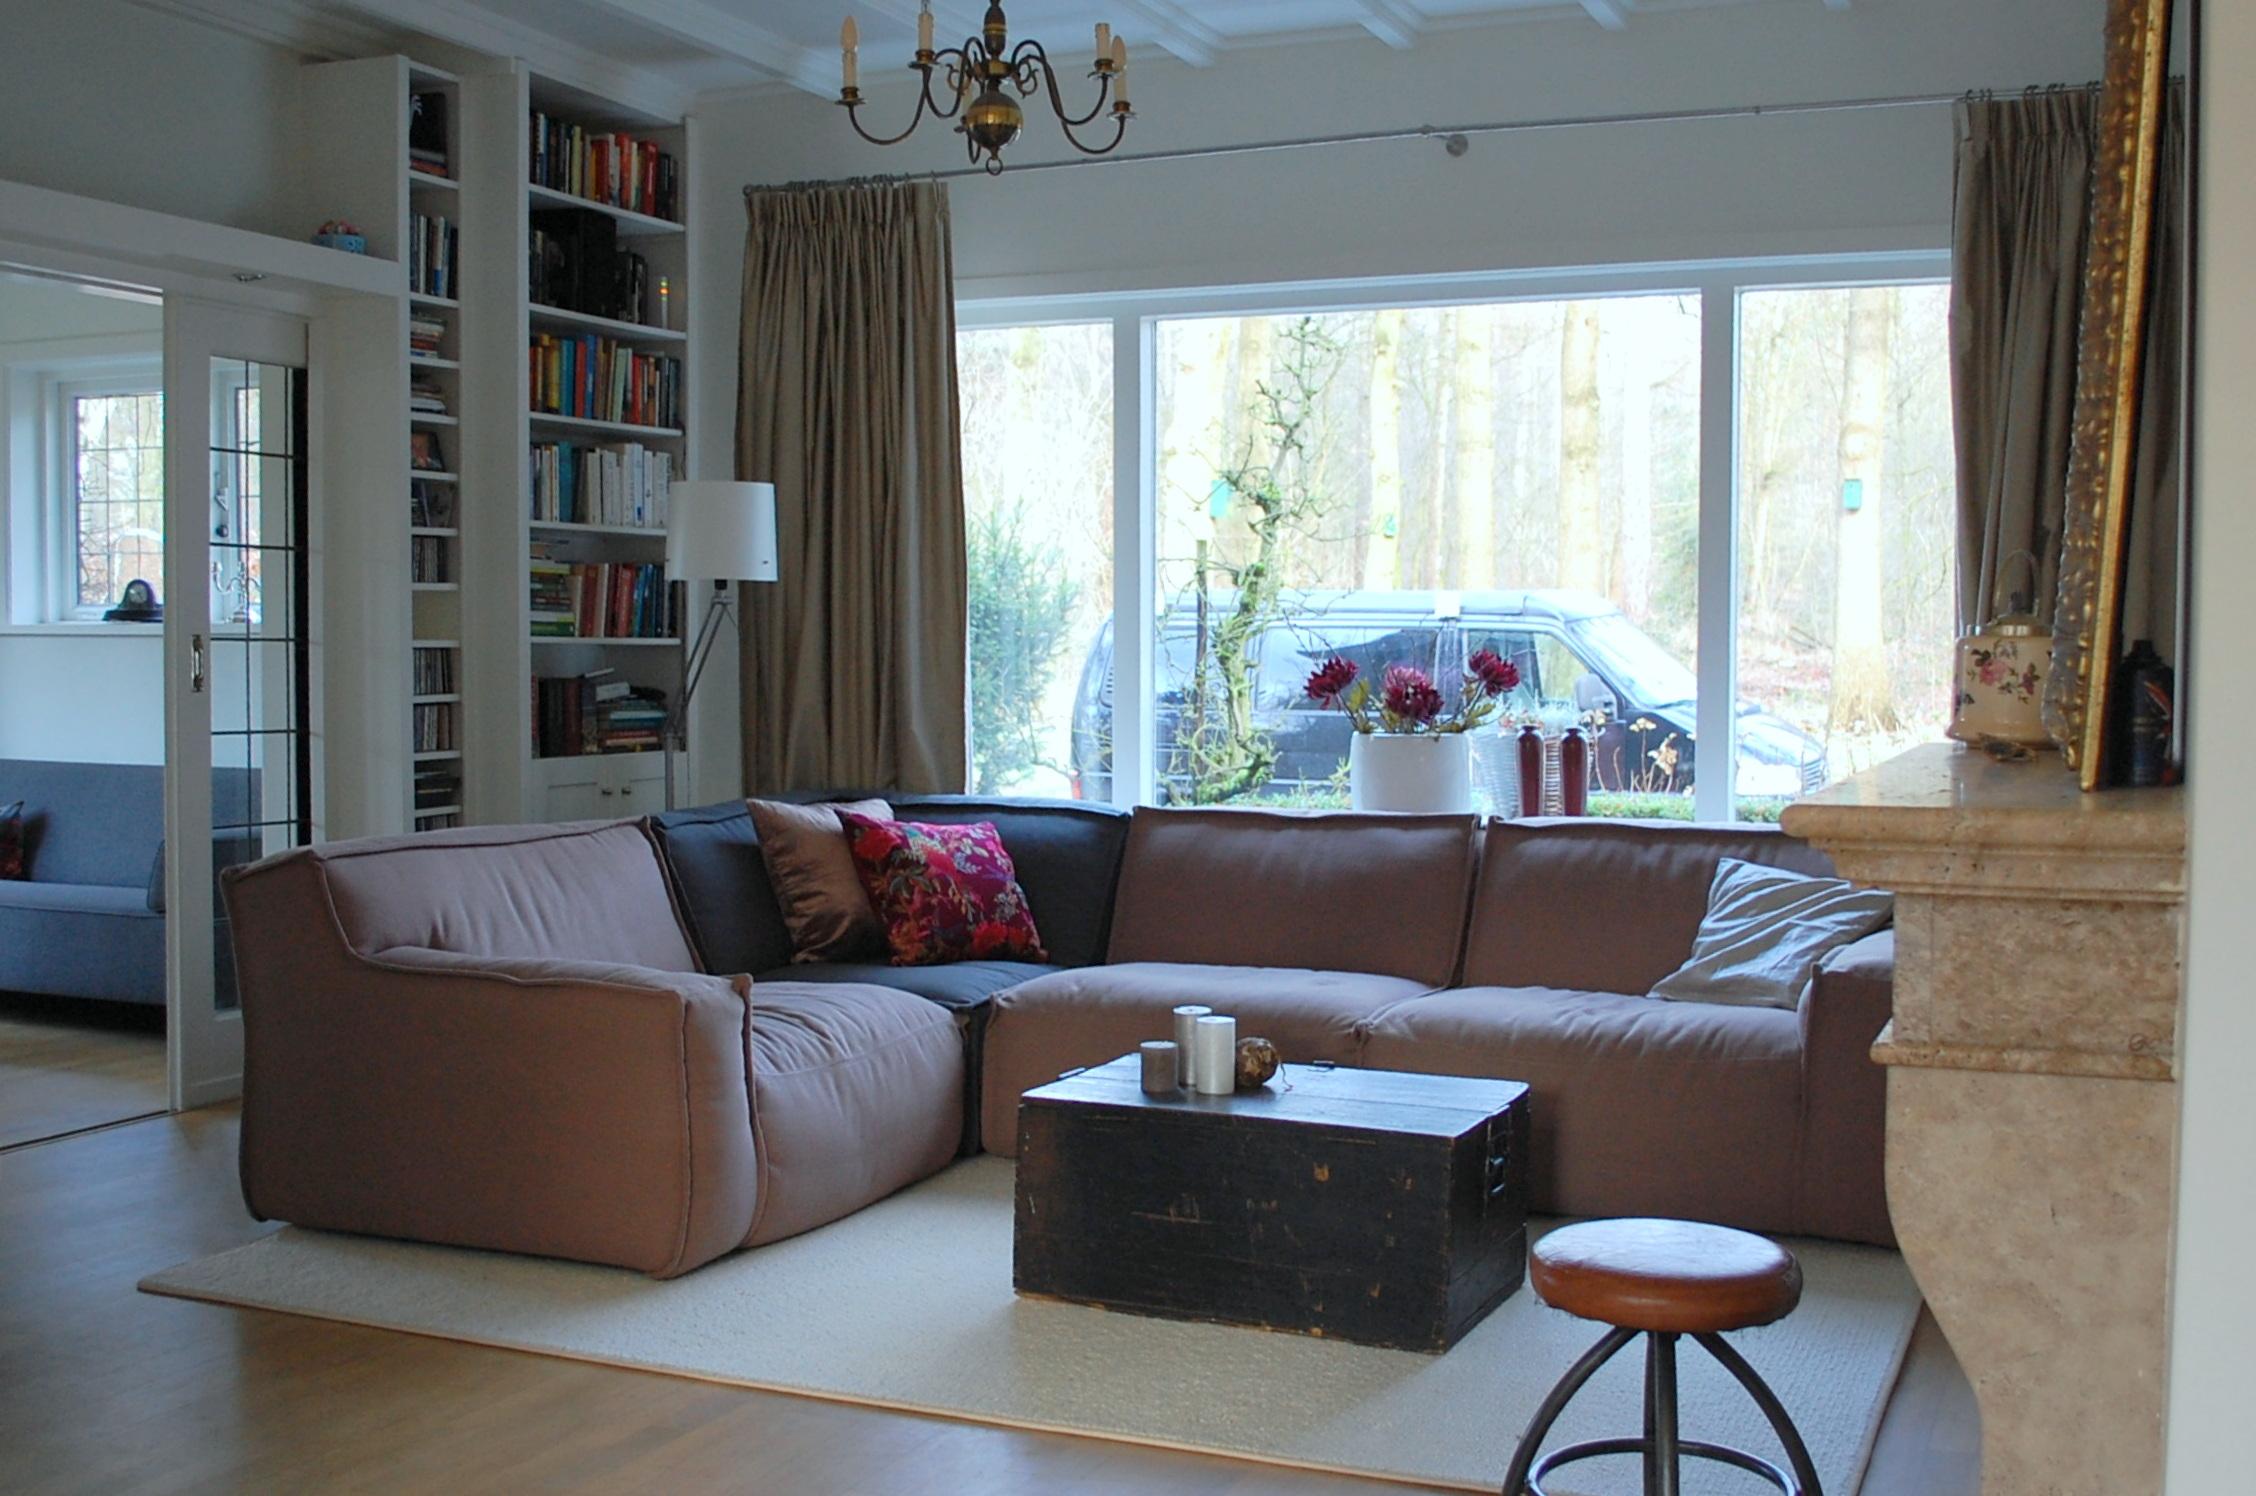 Idee grote gordijnen ramen - Idee deco kleine woonkamer ...